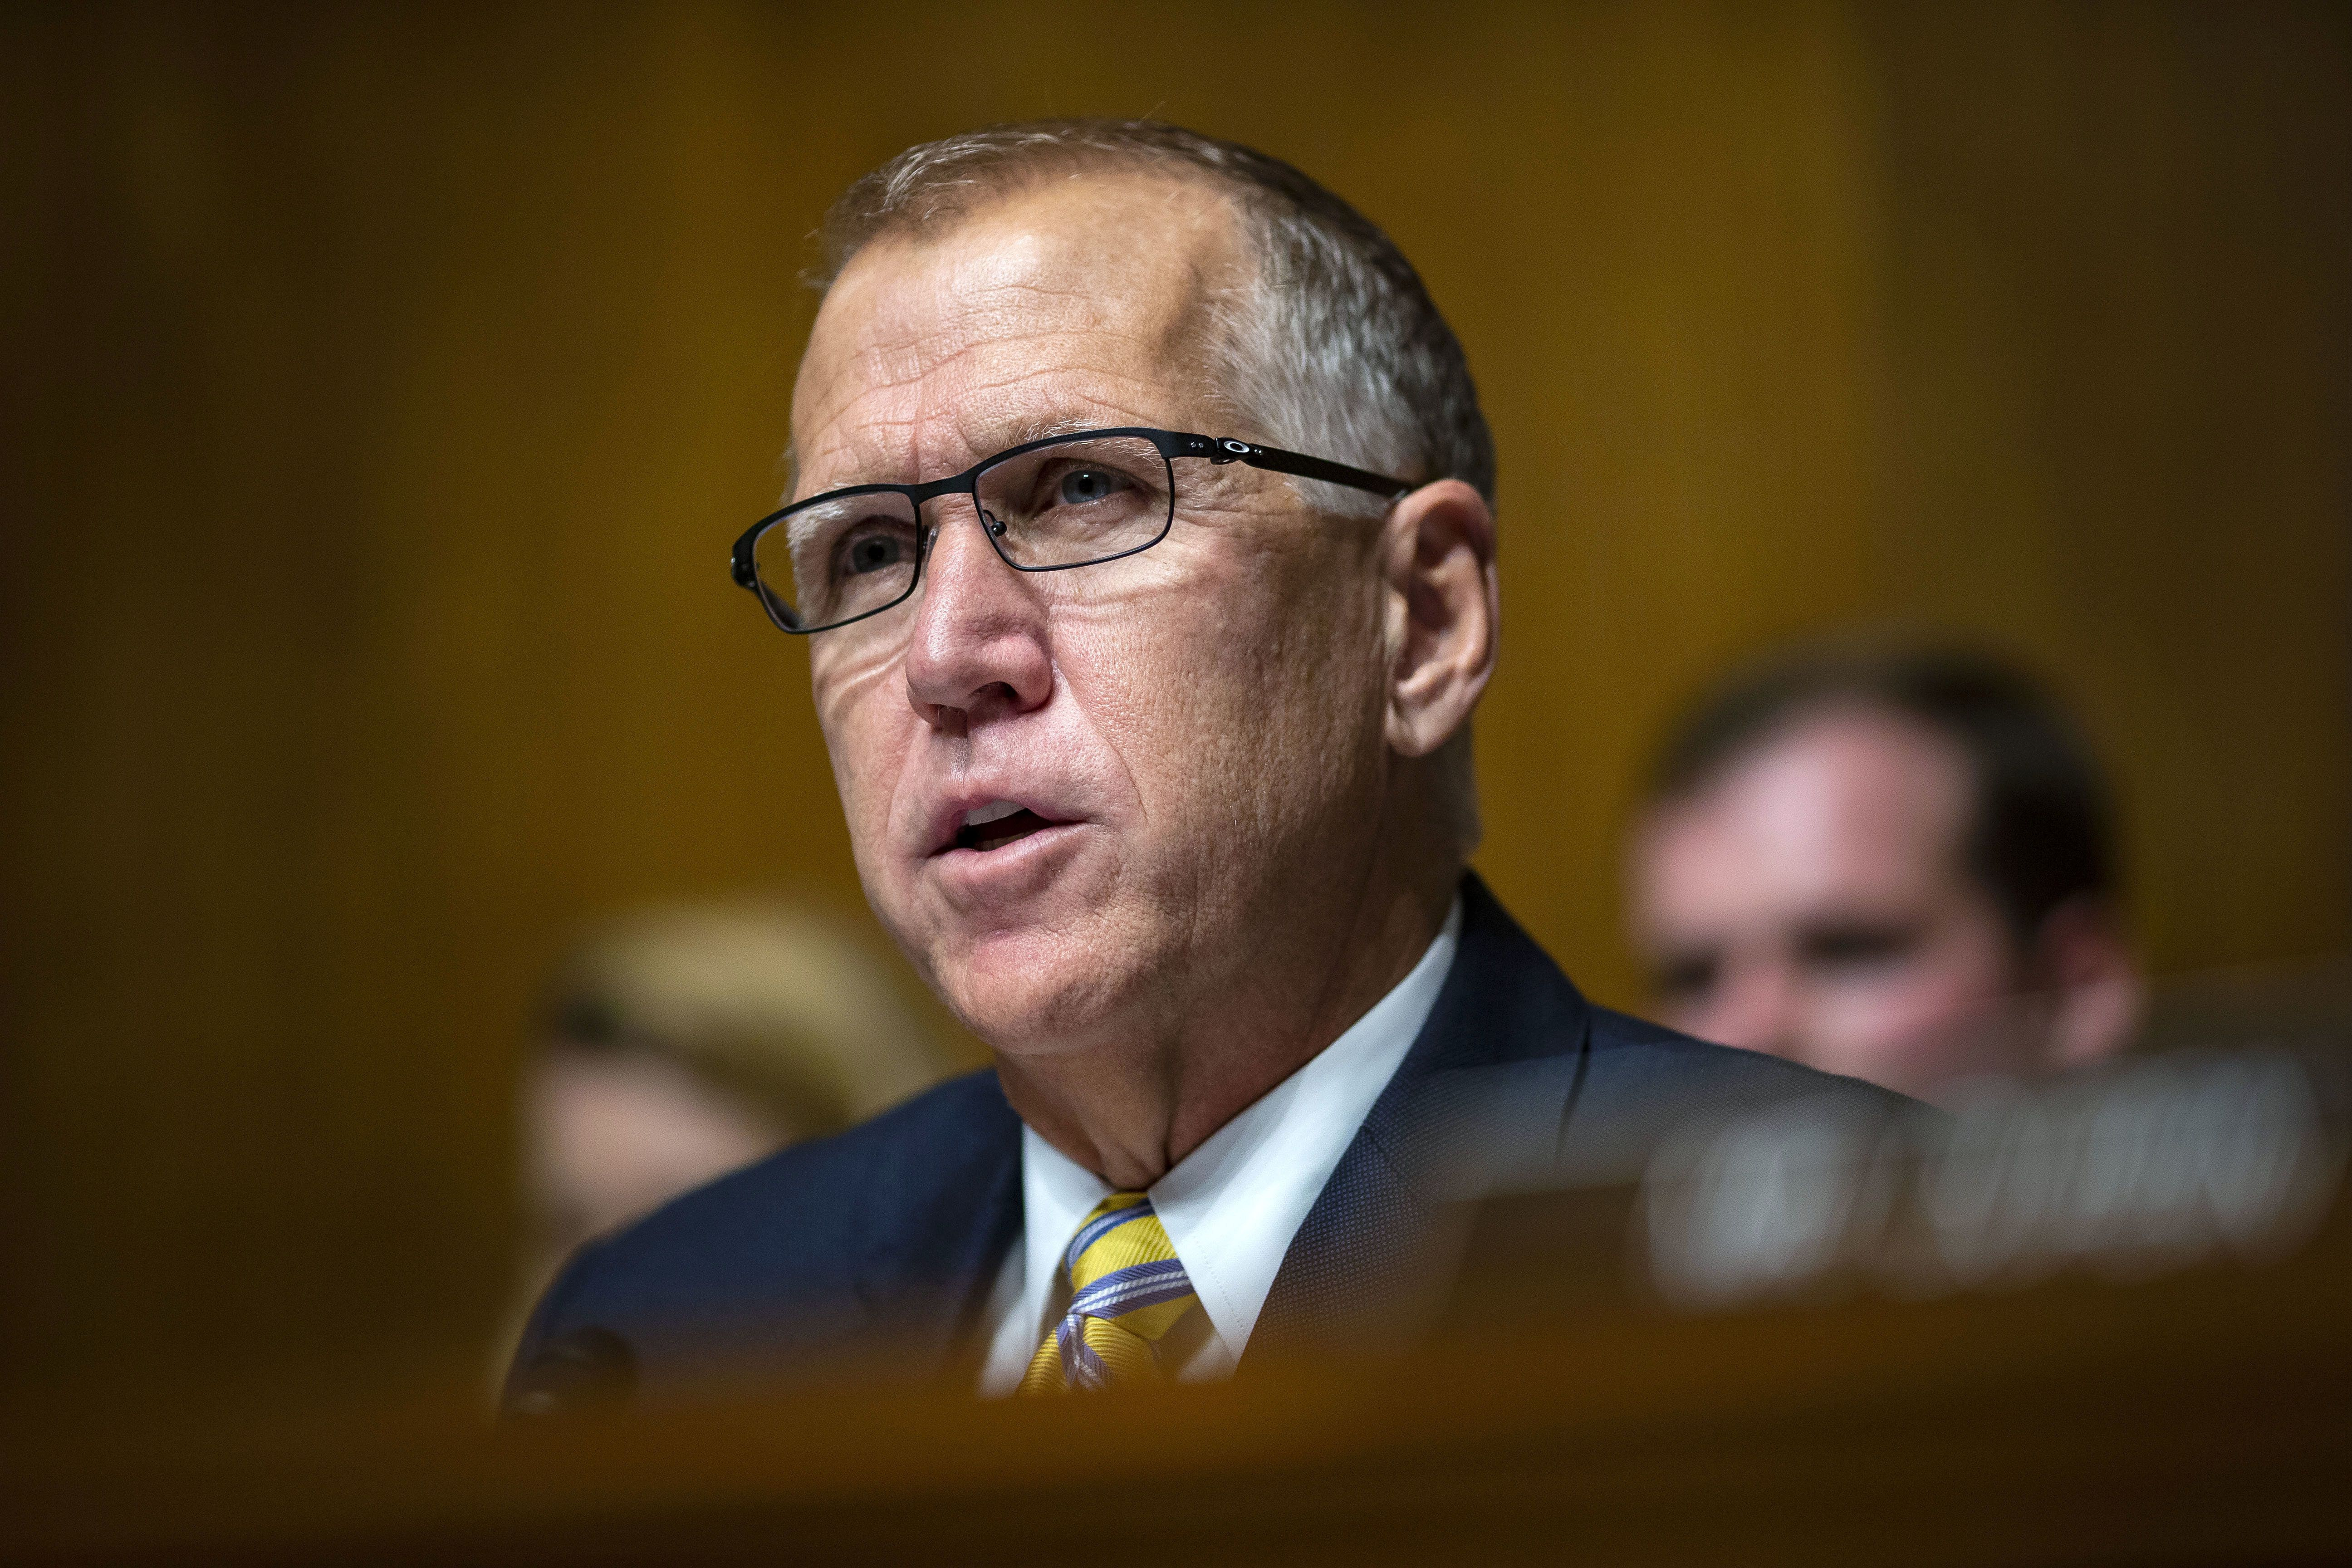 GOP Sen. Thom Tillis Flips On Trump's Emergency Declaration After Opposing It